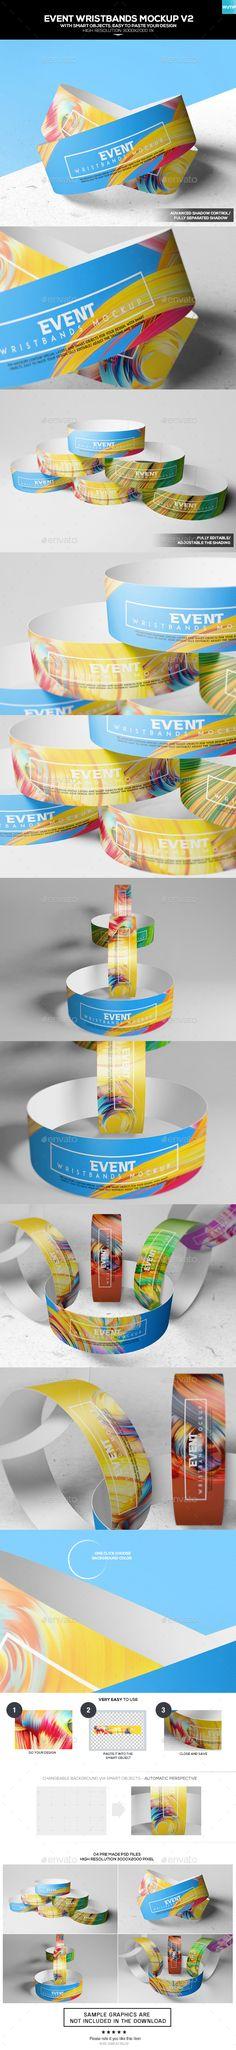 Event Wristbands Mockup V2  — PSD Template #3000x2000 #bands • Download ➝ https://graphicriver.net/item/event-wristbands-mockup-v2/18091792?ref=pxcr